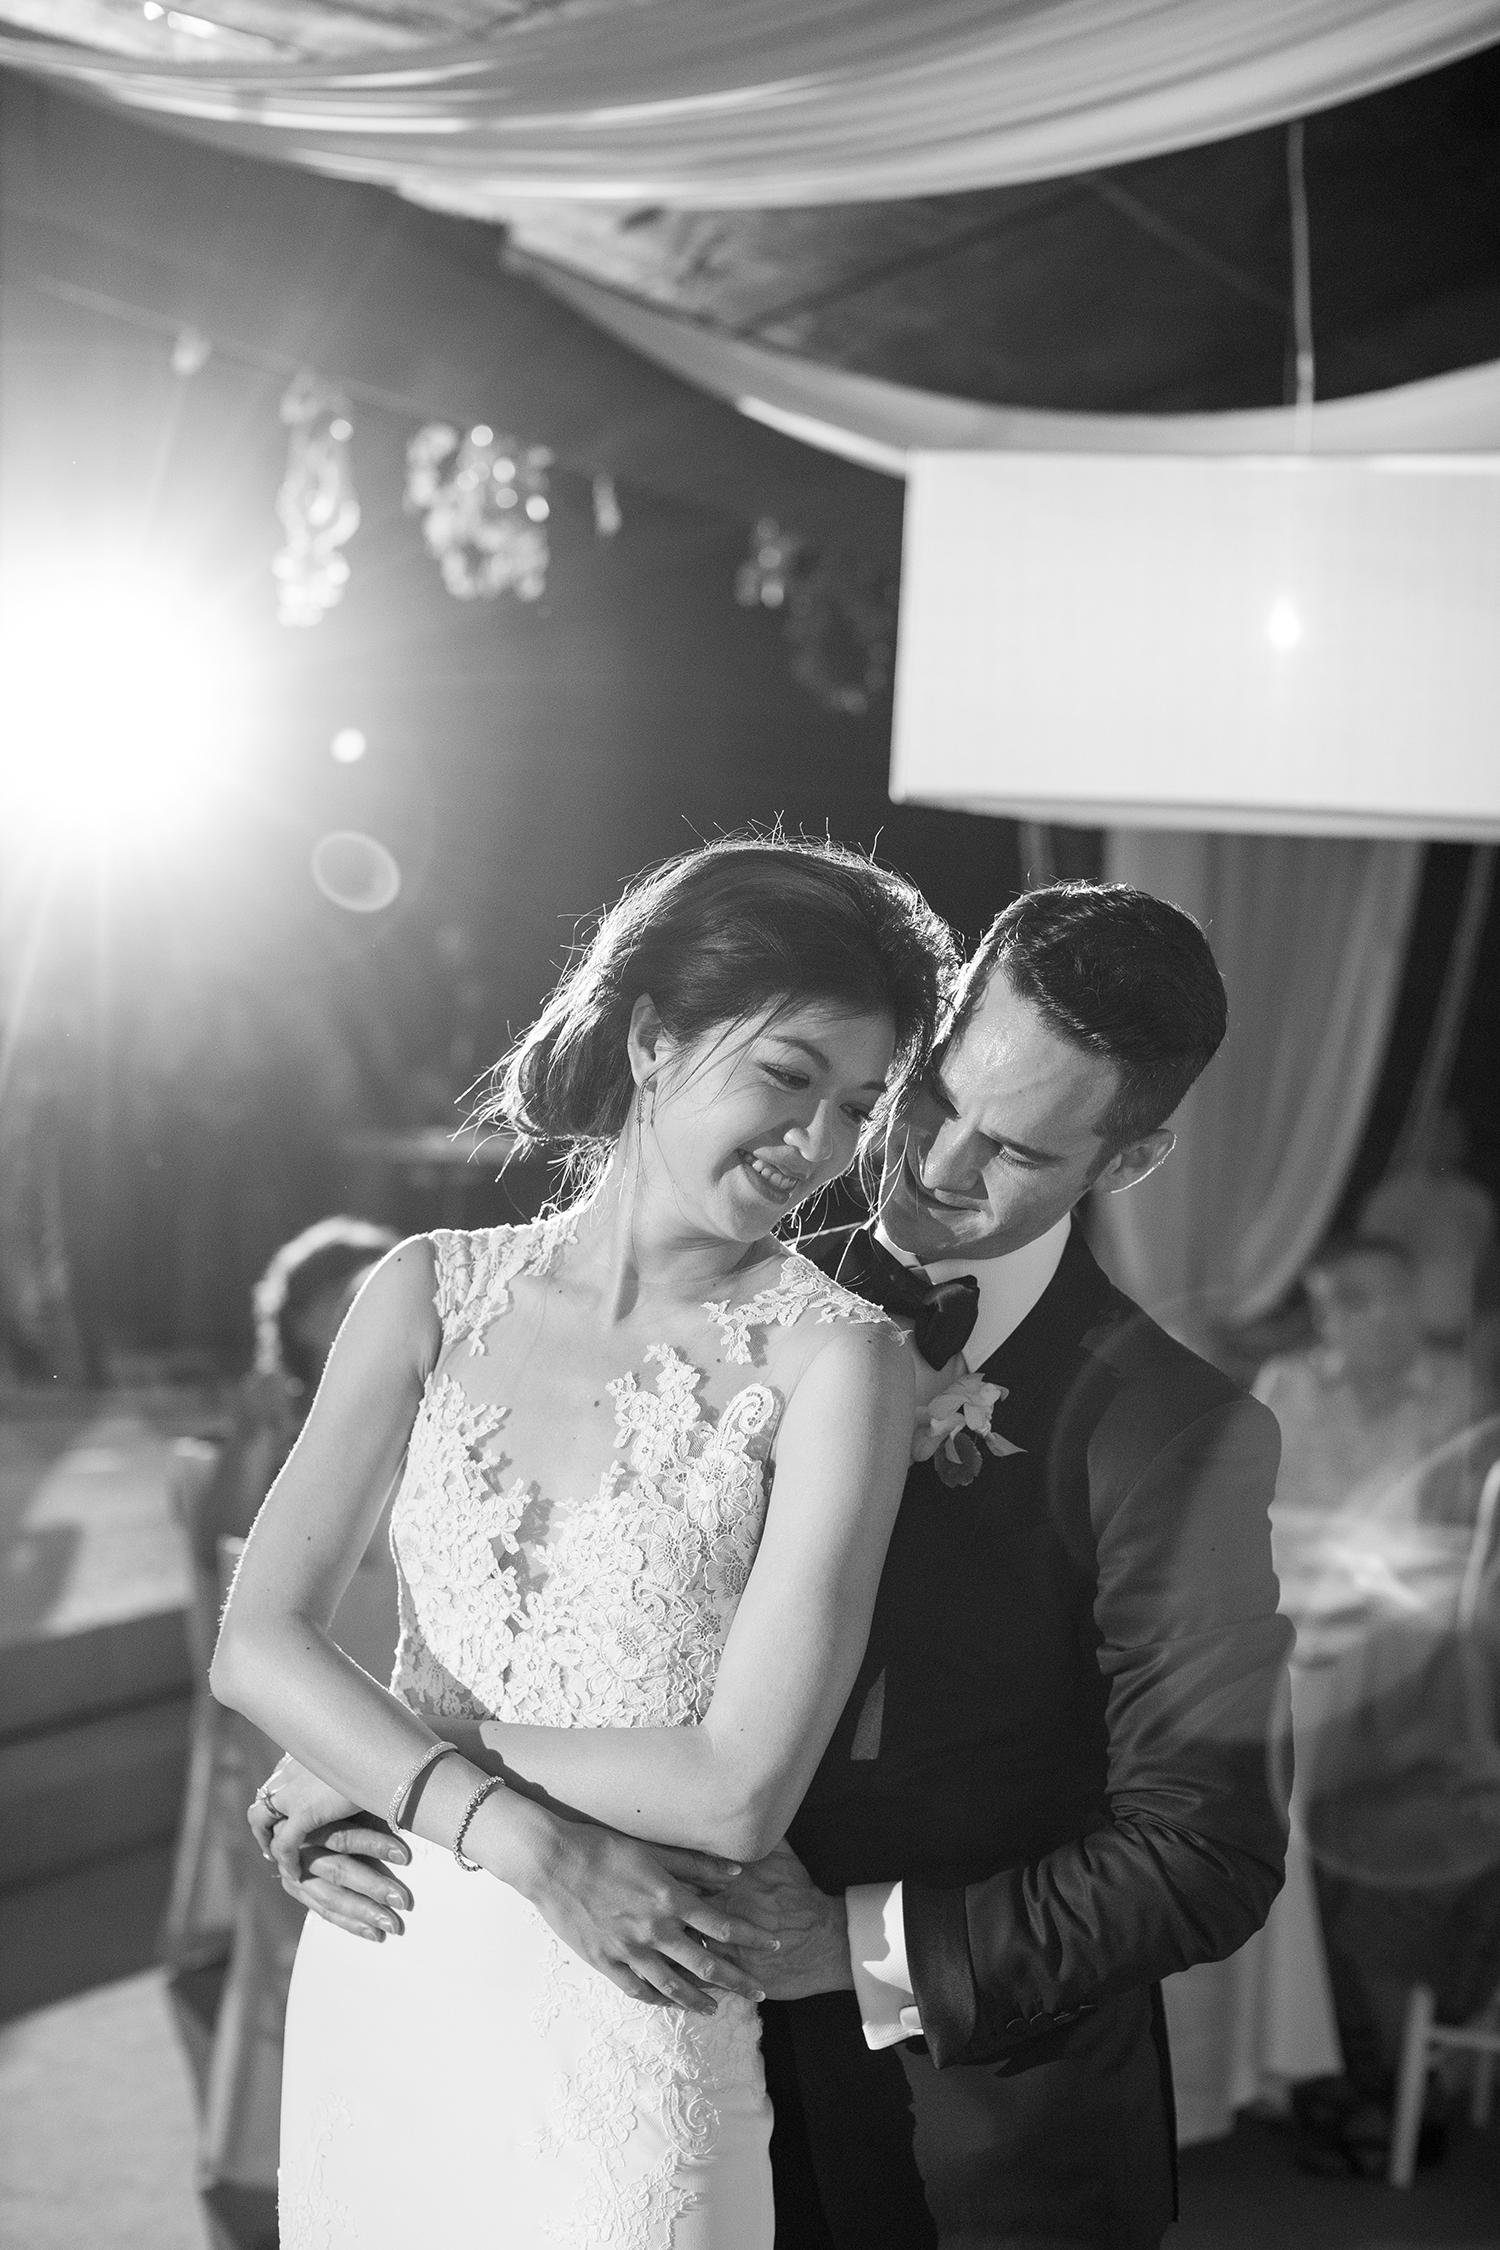 stacy brad wedding thailand first dance